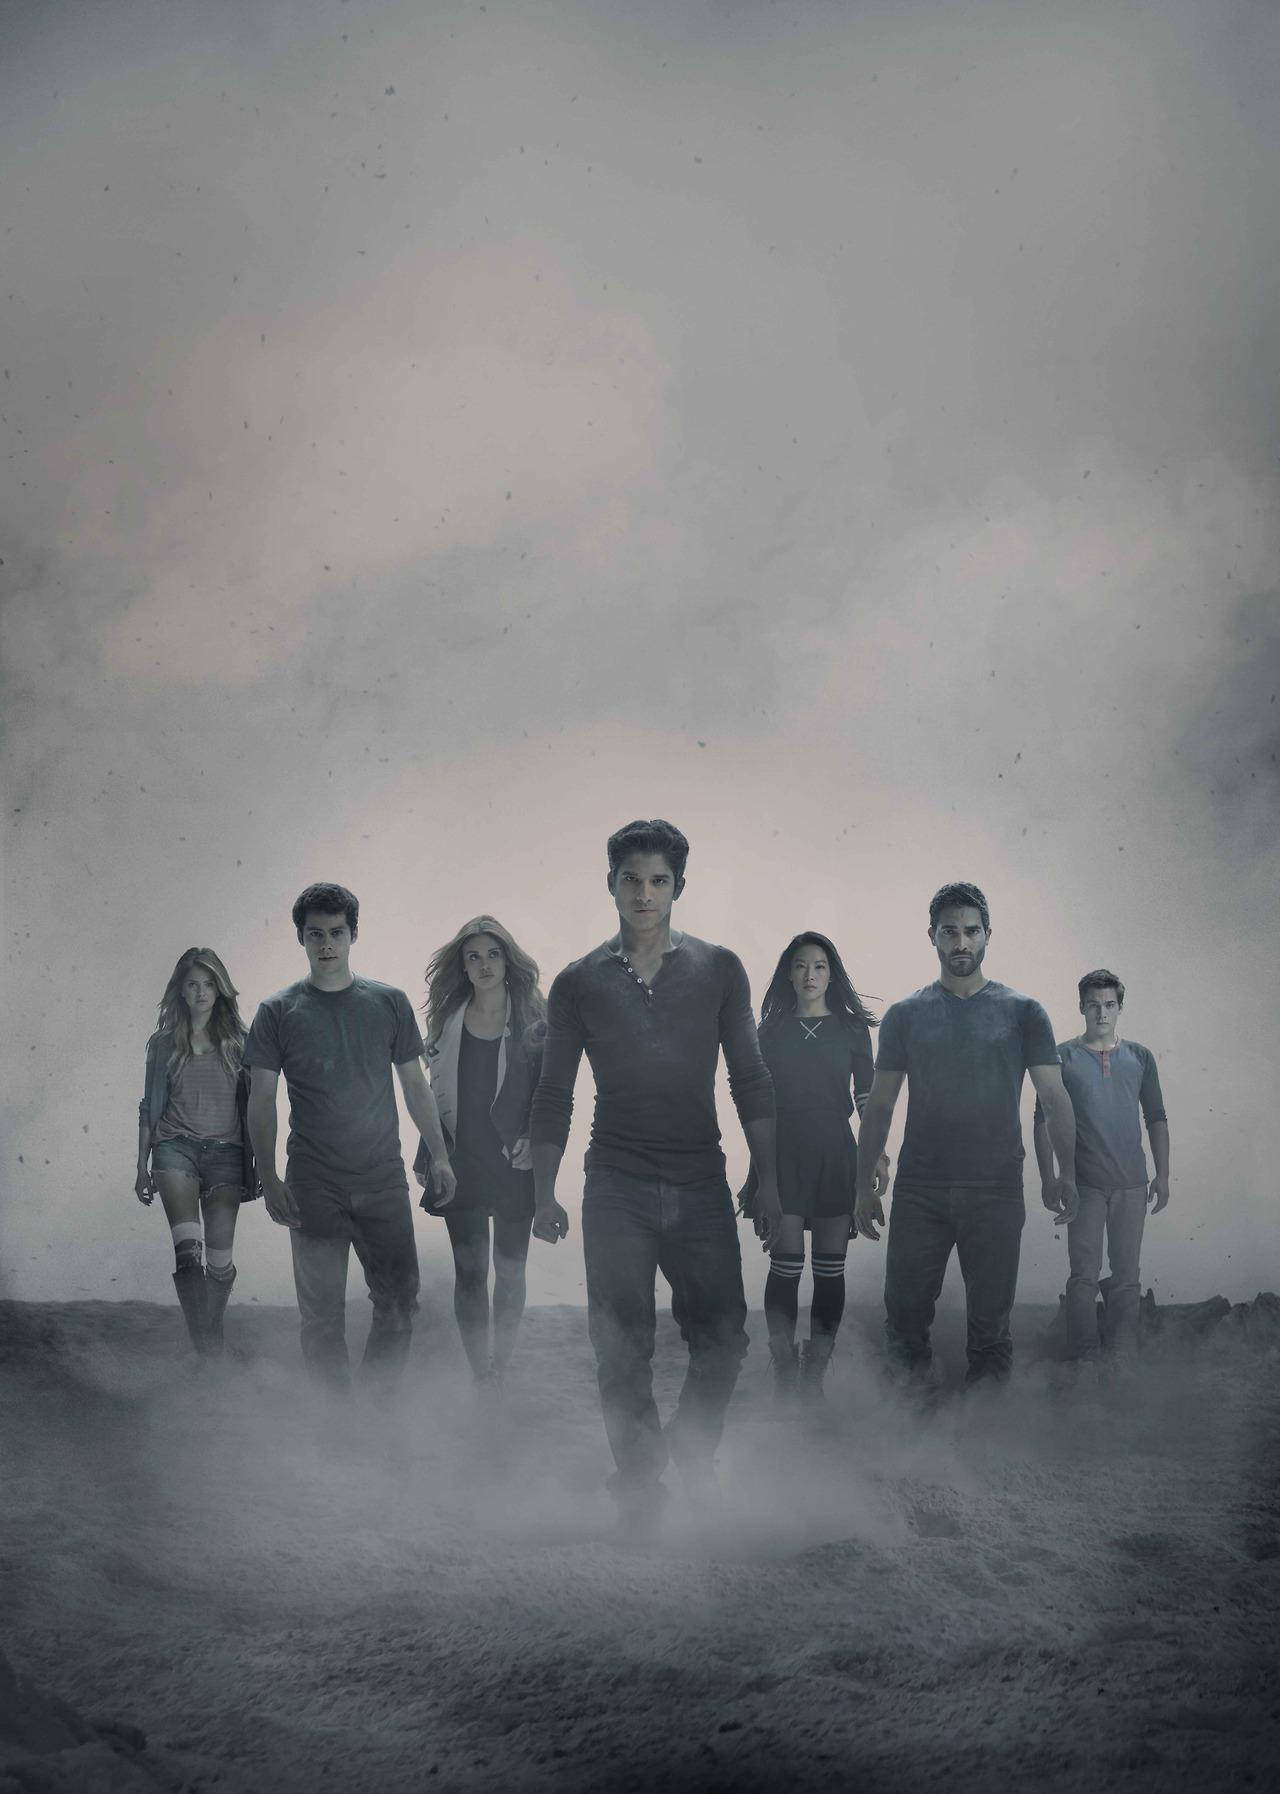 teen-wolf-season-4-poster-cant-go-back-wallpaper-3.jpg